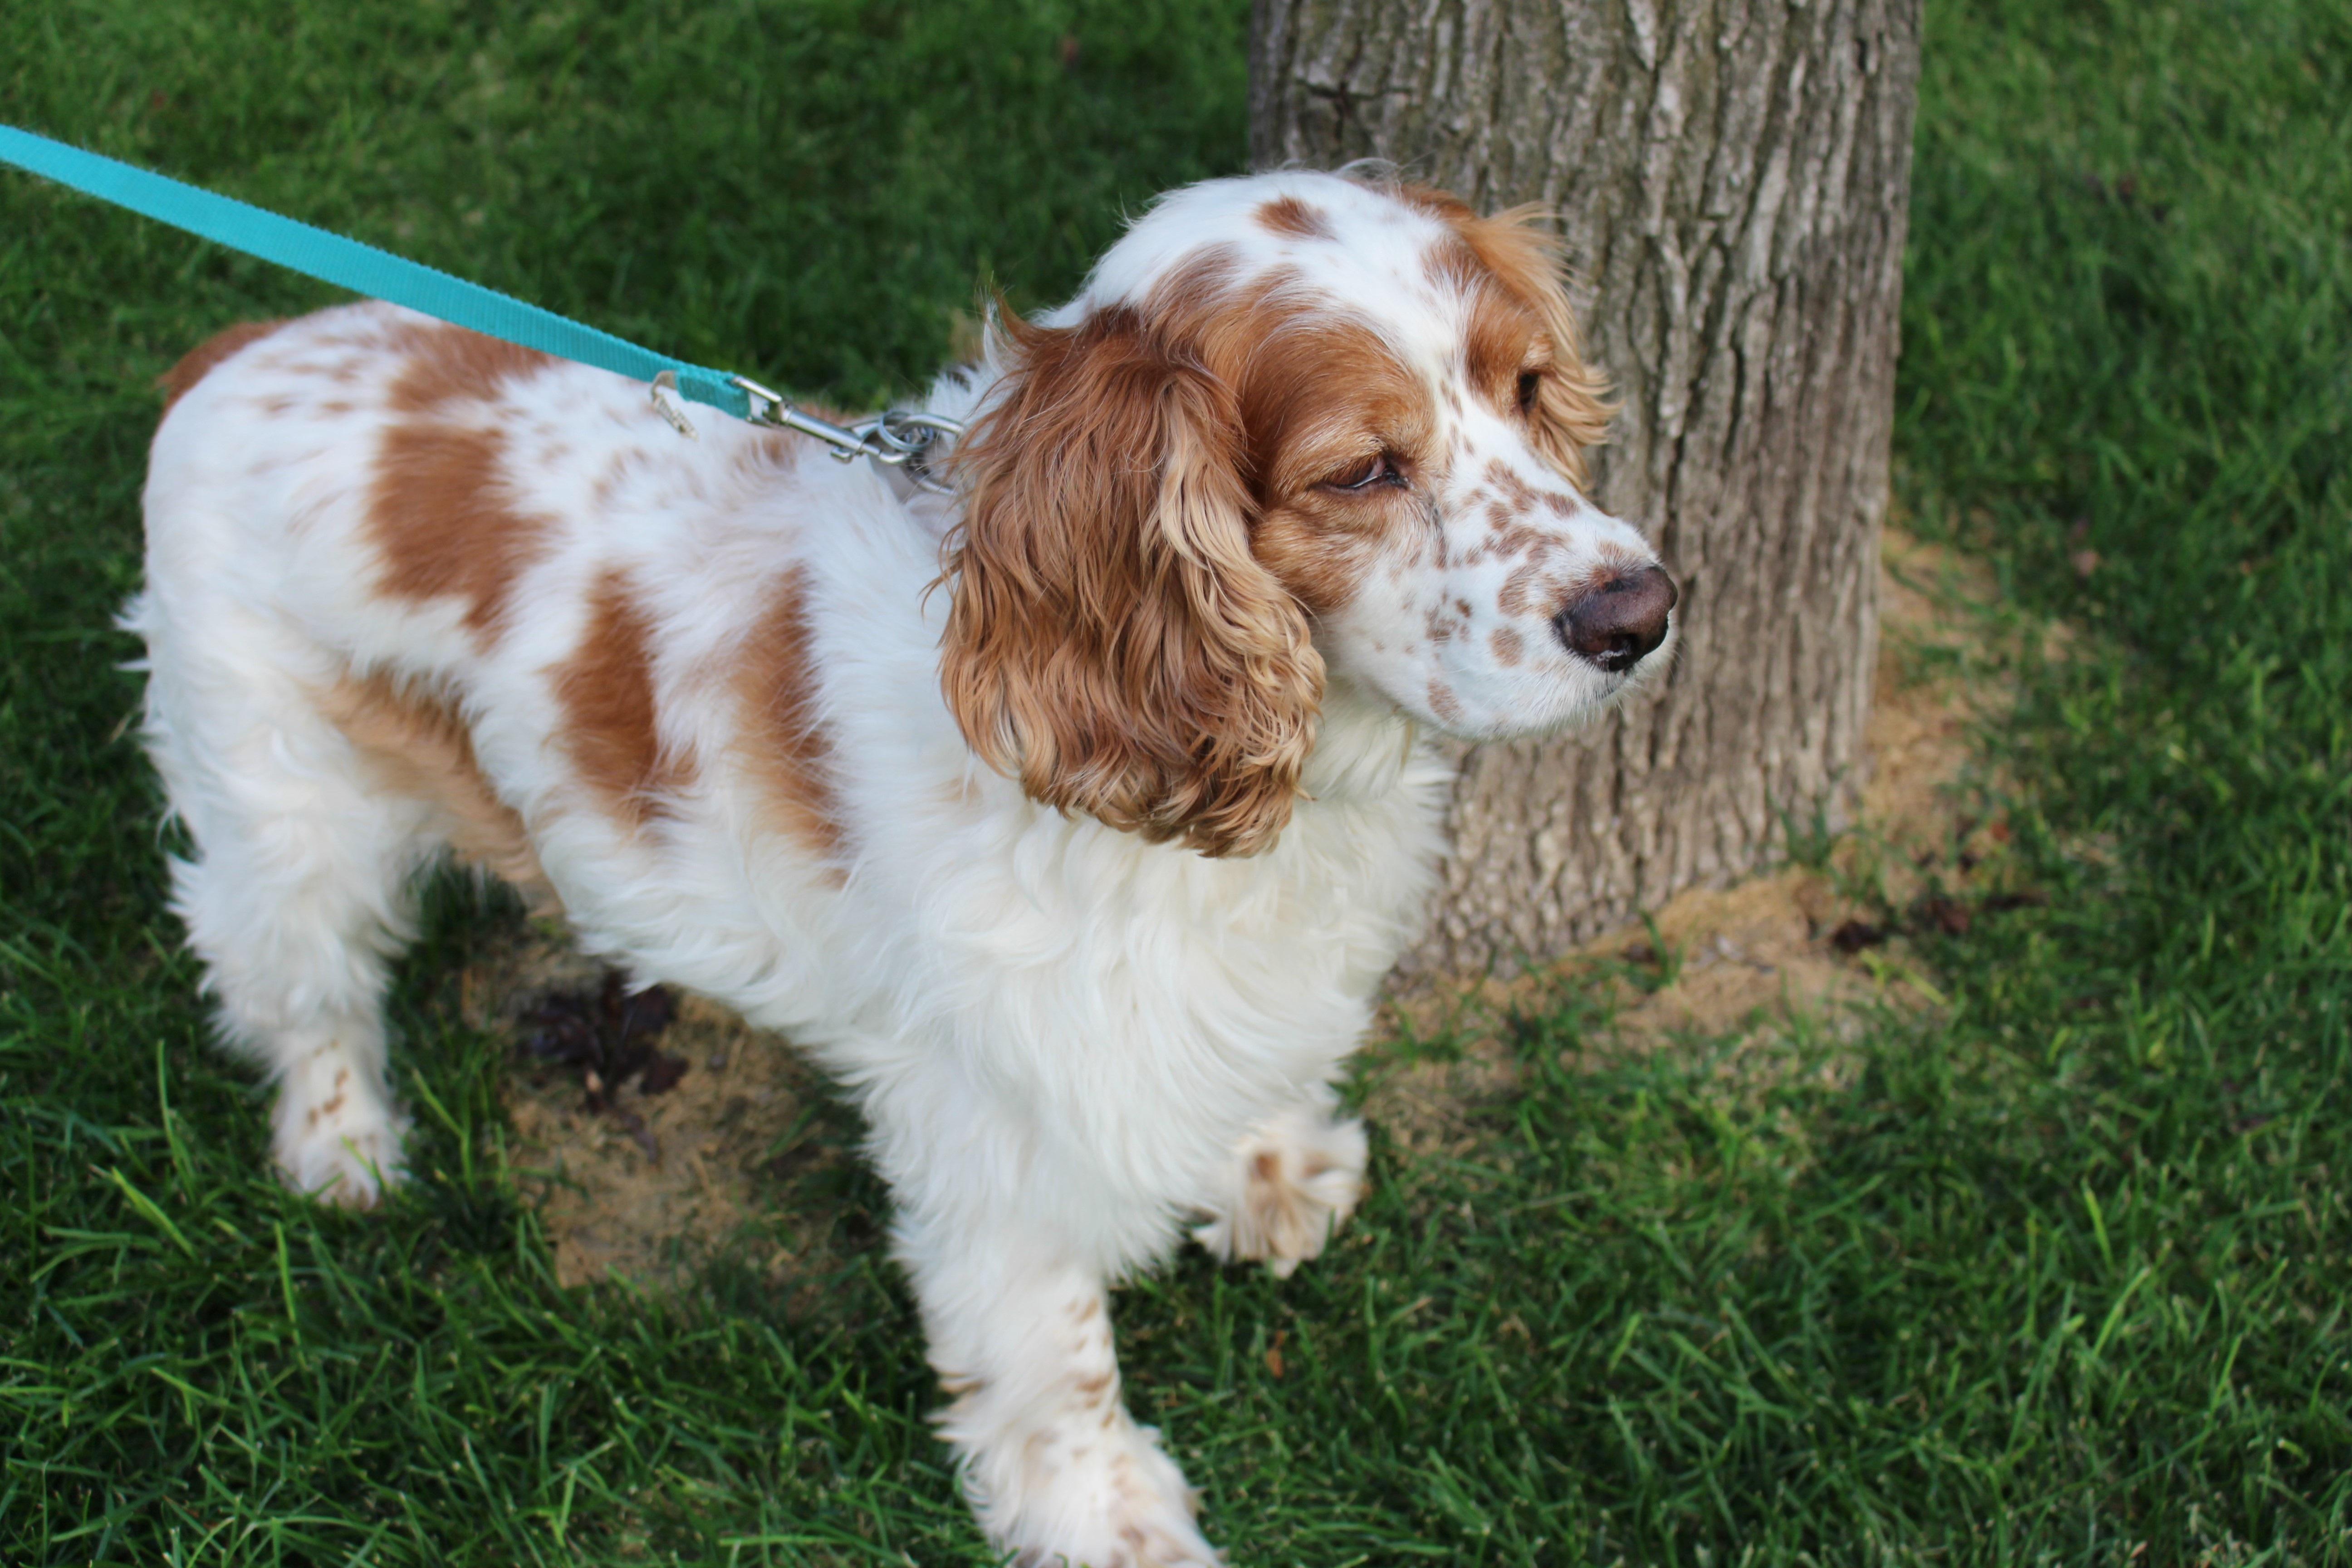 Must see Cavalier Canine Adorable Dog - white-puppy-dog-animal-cute-canine-looking-pet-fur-mammal-spaniel-happy-vertebrate-english-adorable-dog-breed-breed-doggy-cocker-brittany-purebred-cavalier-king-charles-spaniel-cats-and-dogs-king-charles-spaniel-setter-dog-like-mammal-carnivoran-english-cocker-spaniel-dog-crossbreeds-english-springer-spaniel-drentse-patrijshond-french-spaniel-cavachon-russian-spaniel-field-spaniel-american-cocker-spaniel-welsh-springer-spaniel-picardy-spaniel-694207  Perfect Image Reference_103319  .jpg